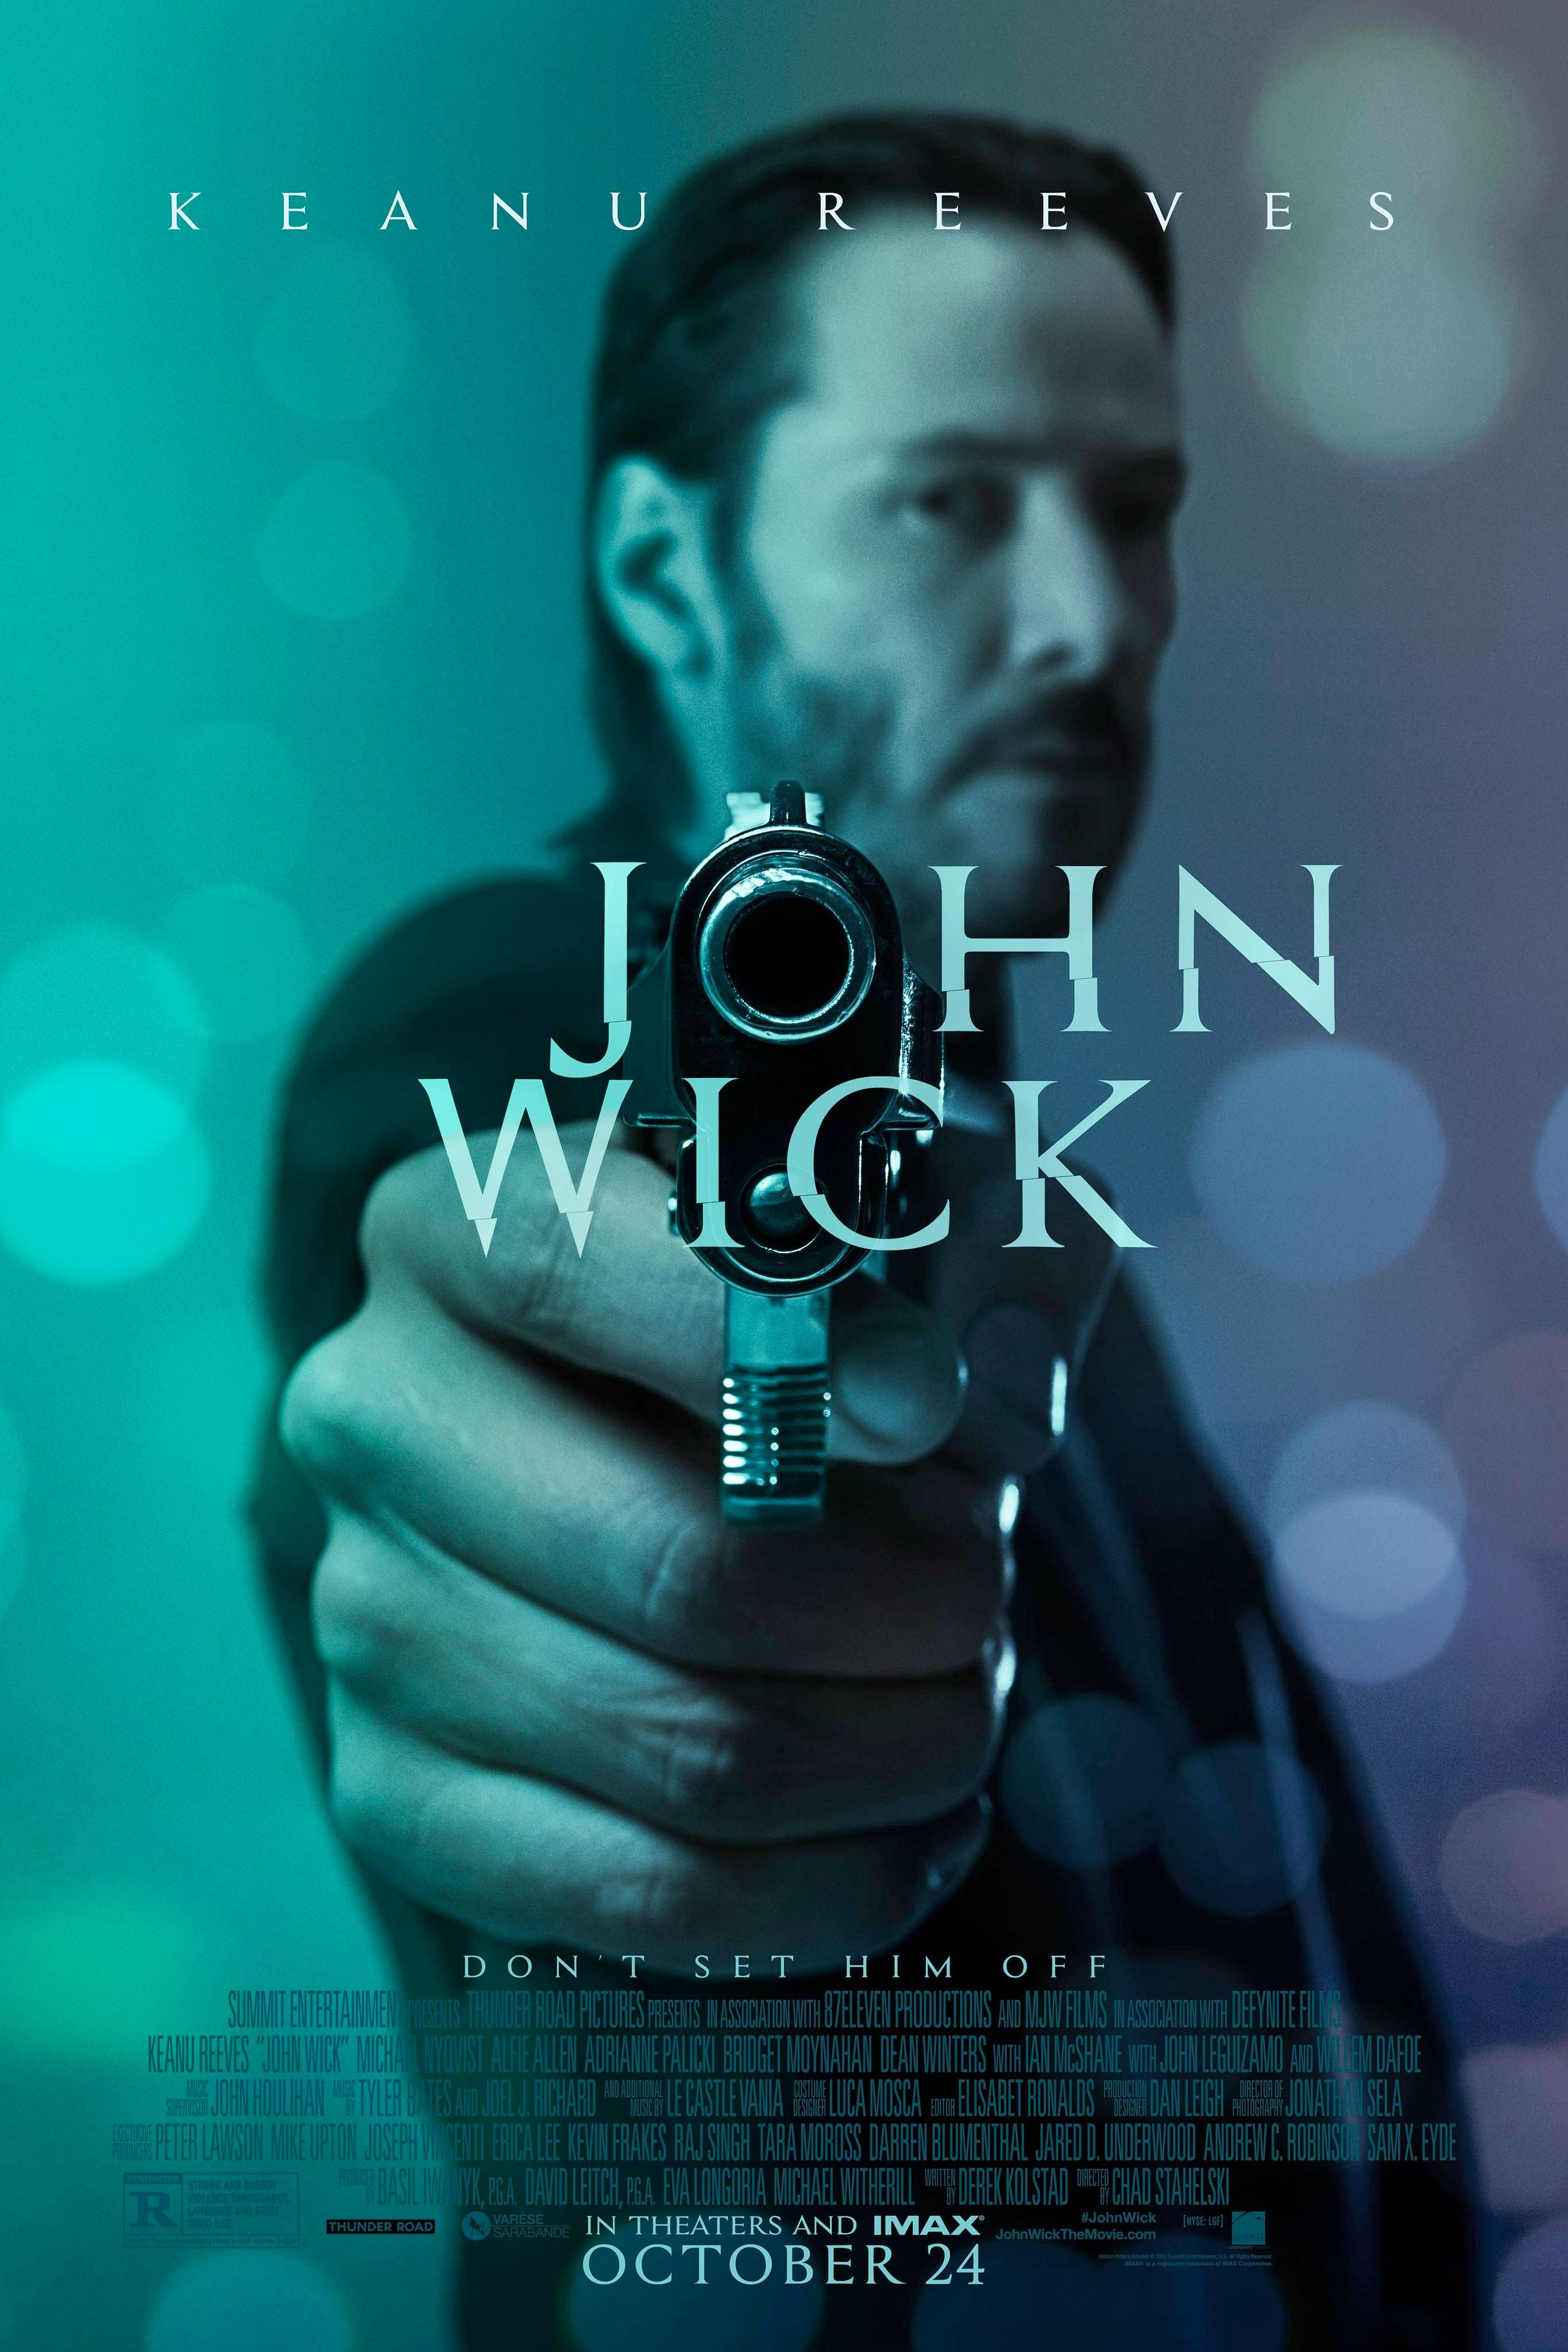 John Wick 2 Keanu Reeves In Action In Set Video Images